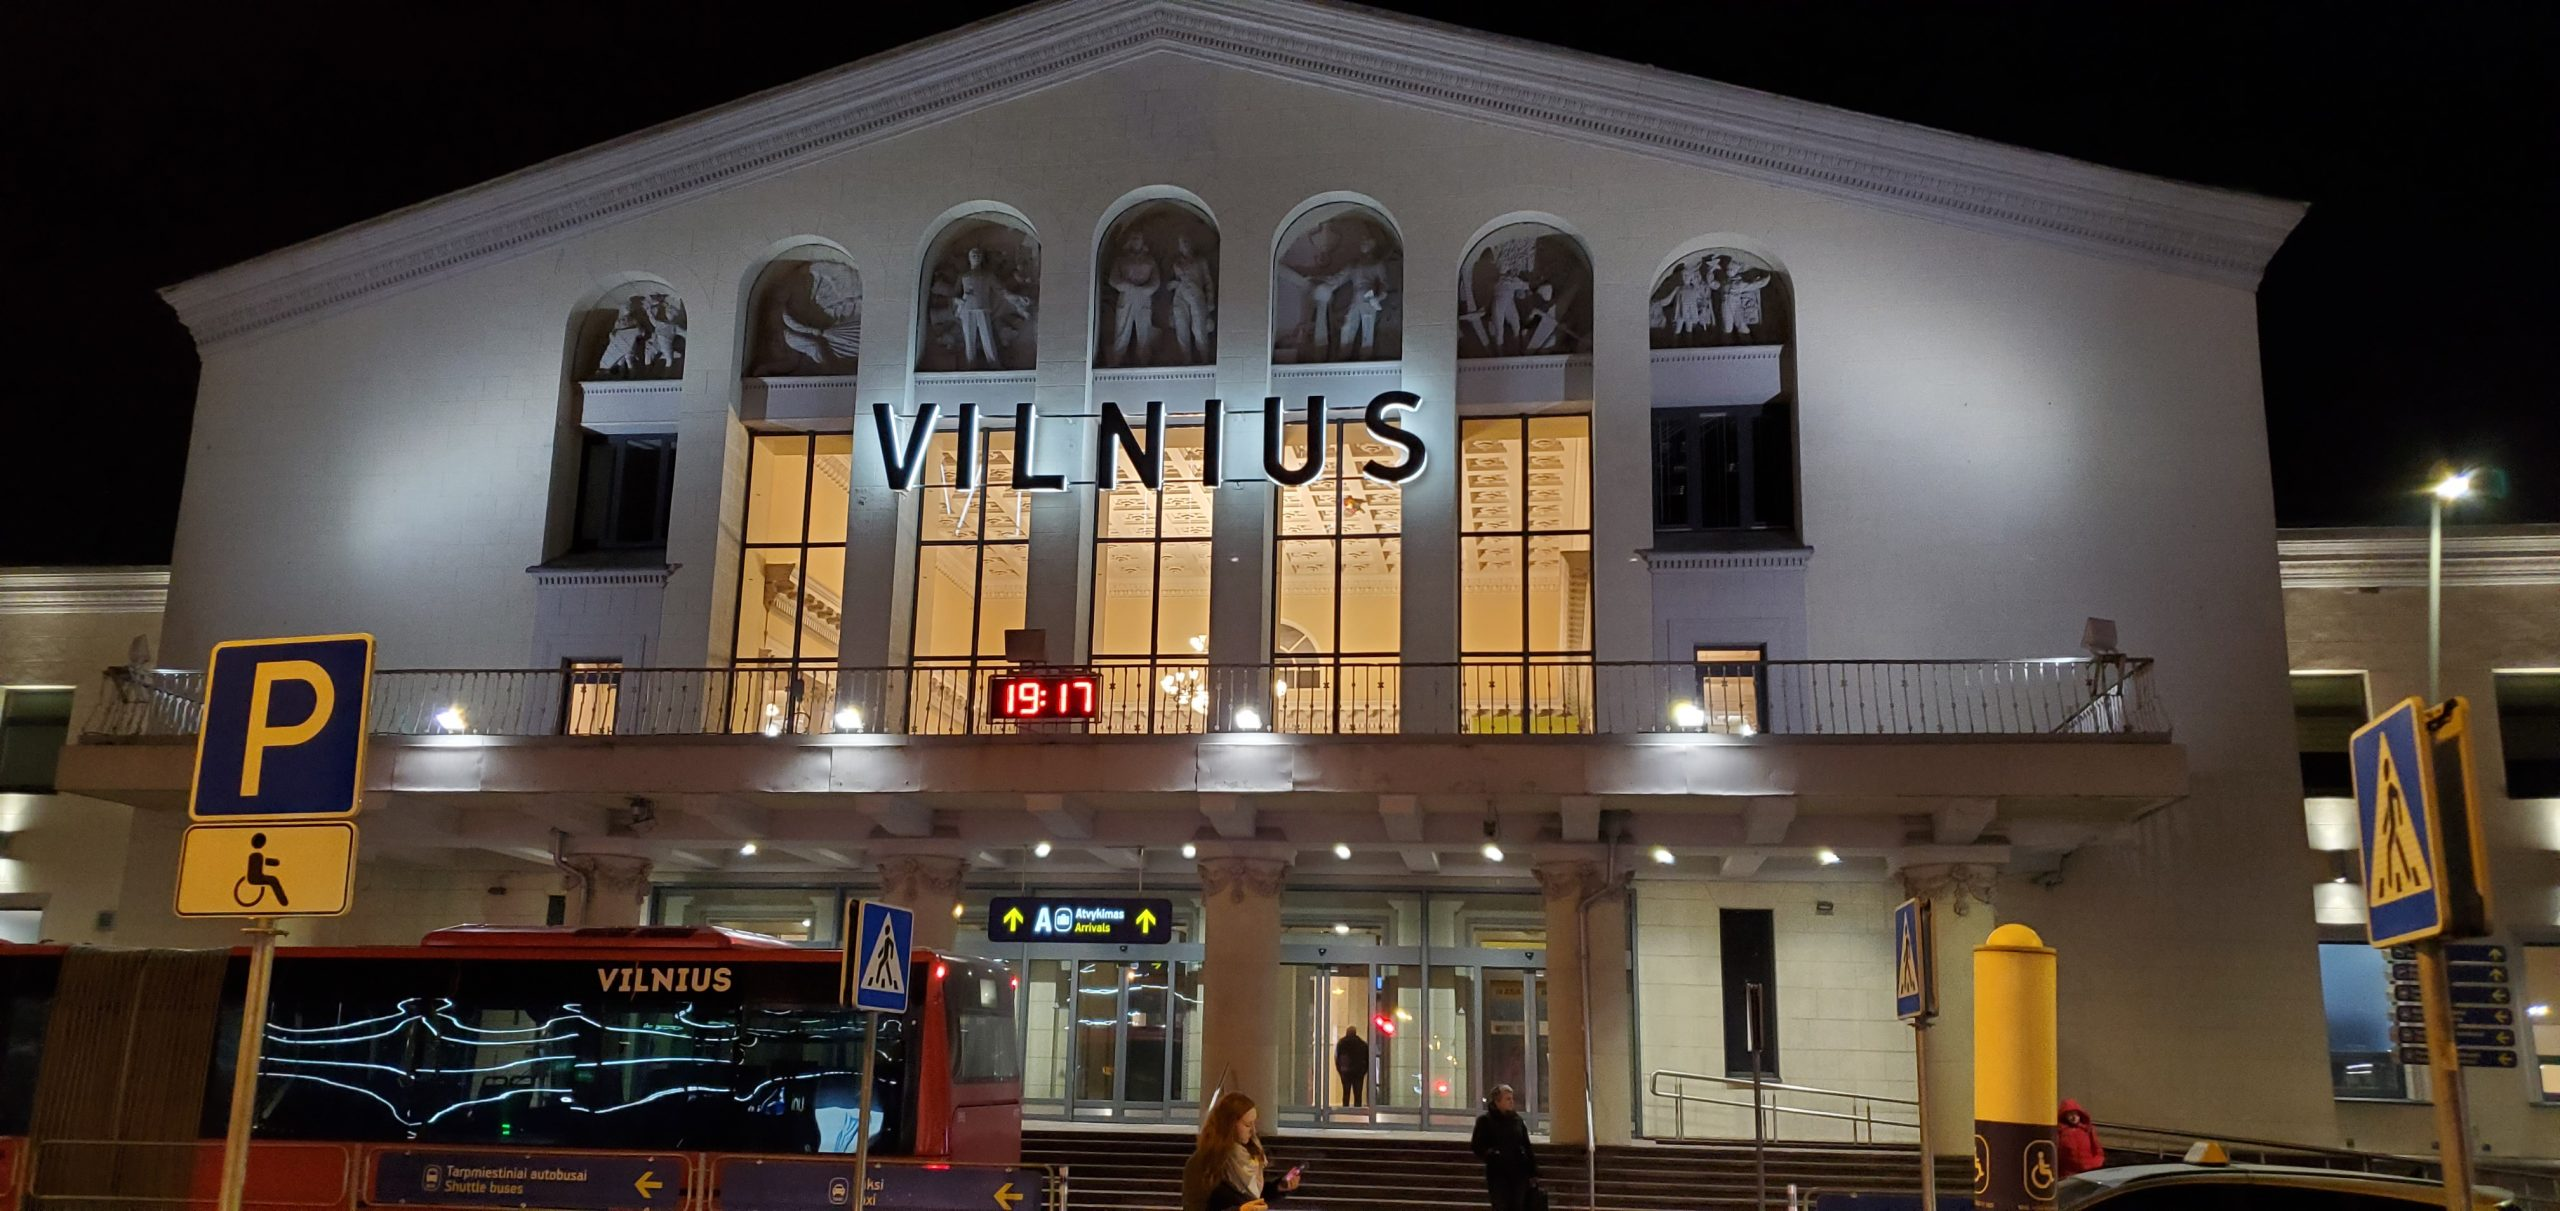 Vilnius Airport Arrivals Hall (VNO)